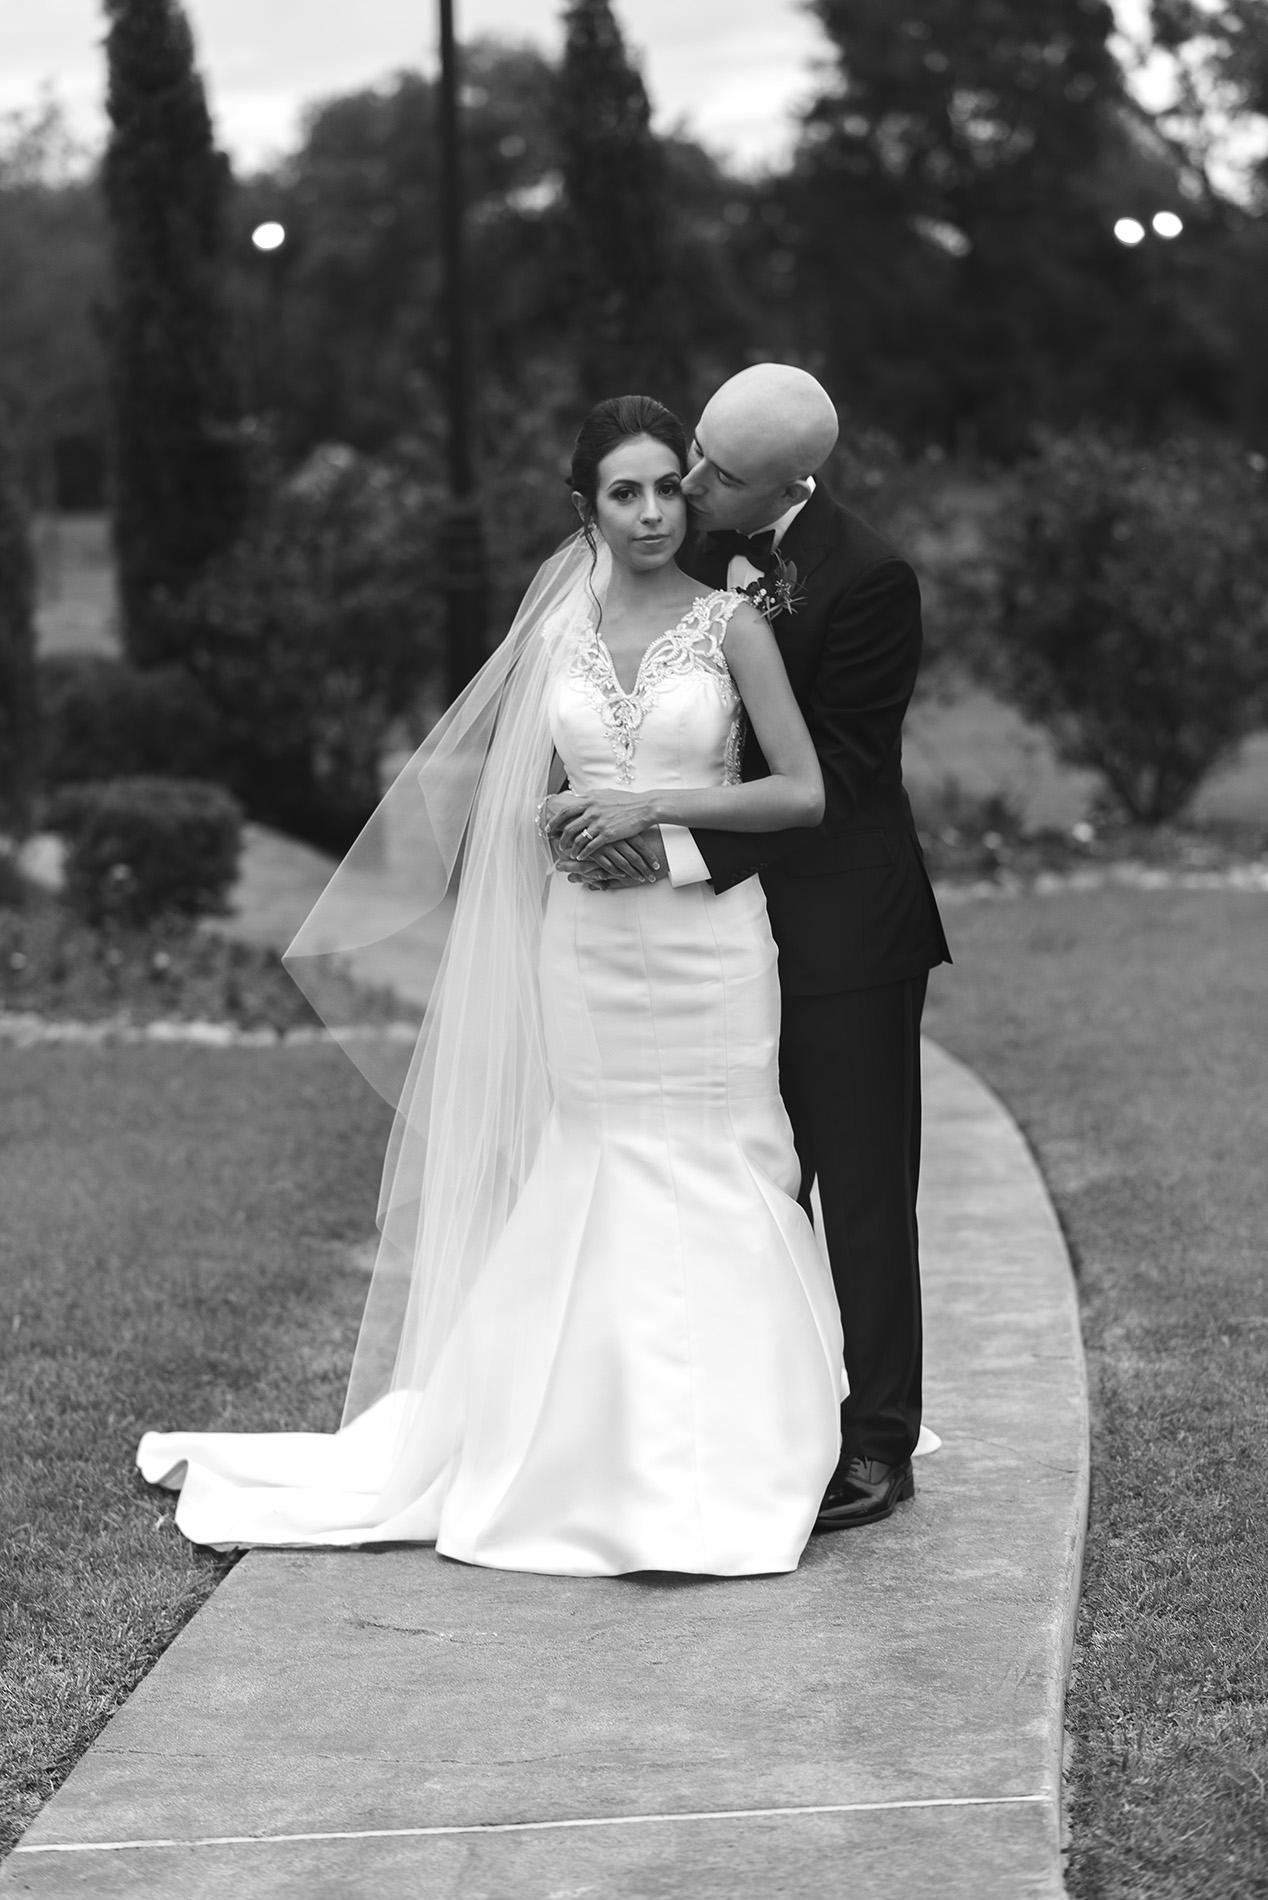 Houston-venue-Olde-Dobbin-Station-Romantic-Classic-Wedding-Photographer-089.jpg